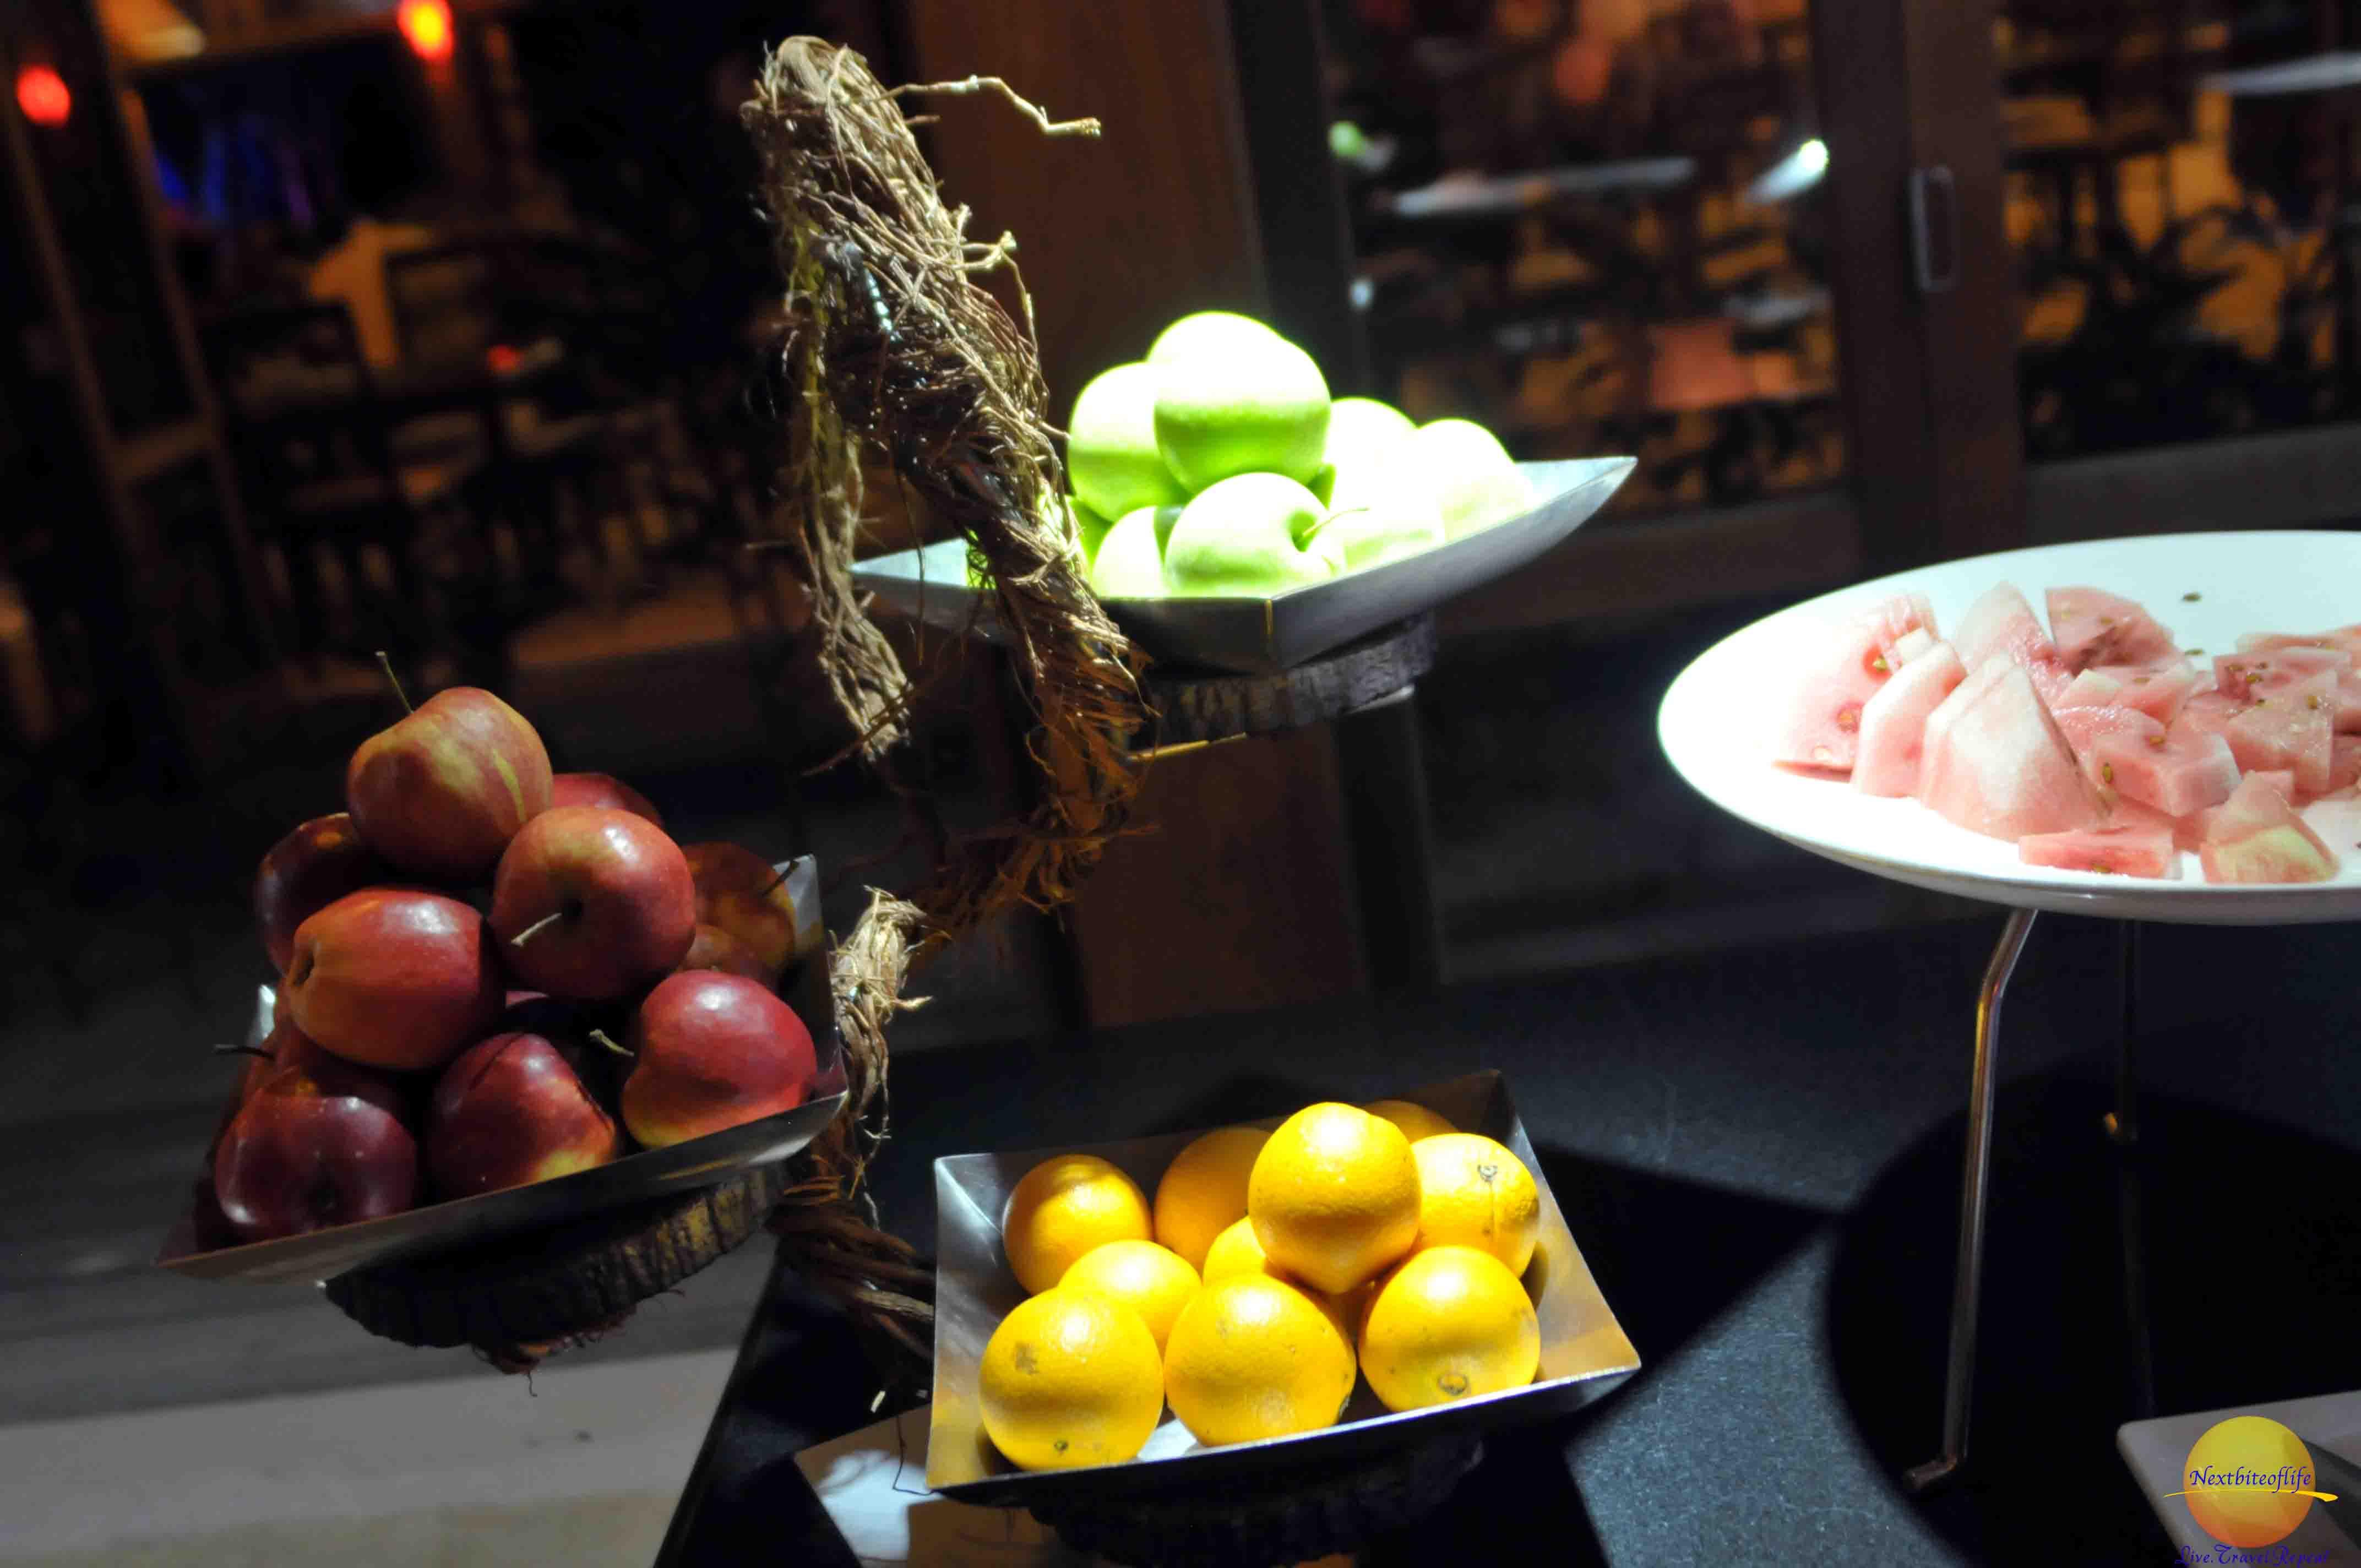 images of fruit in bowls at resort